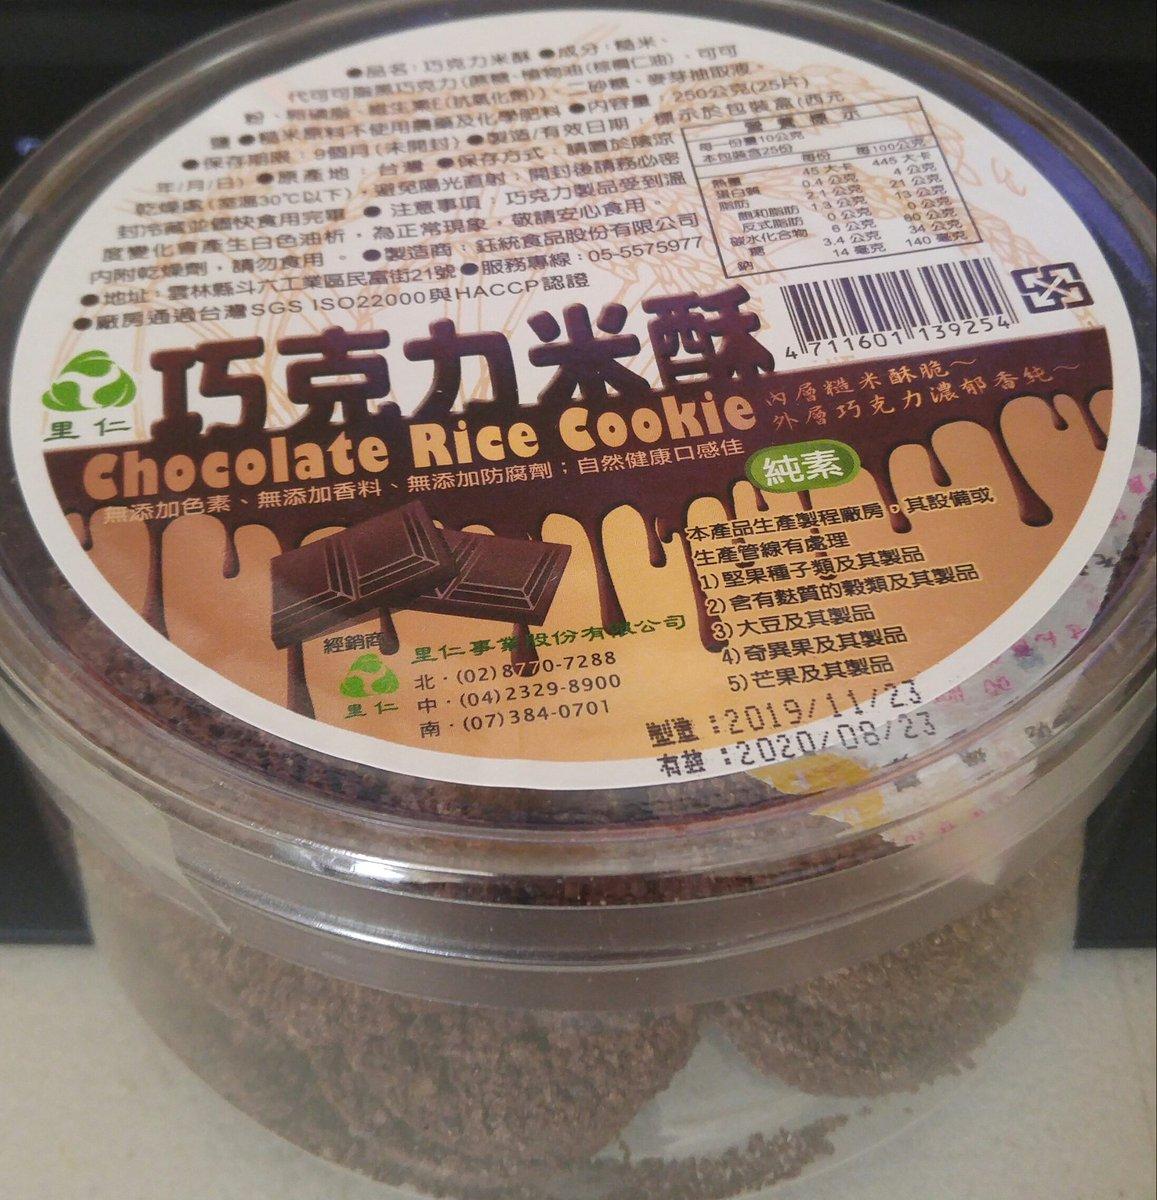 The ultimate #vegan #chocolatecookie in terms of flavor amd crumbliness. #veganfood #veganlife #cookies #chocolate